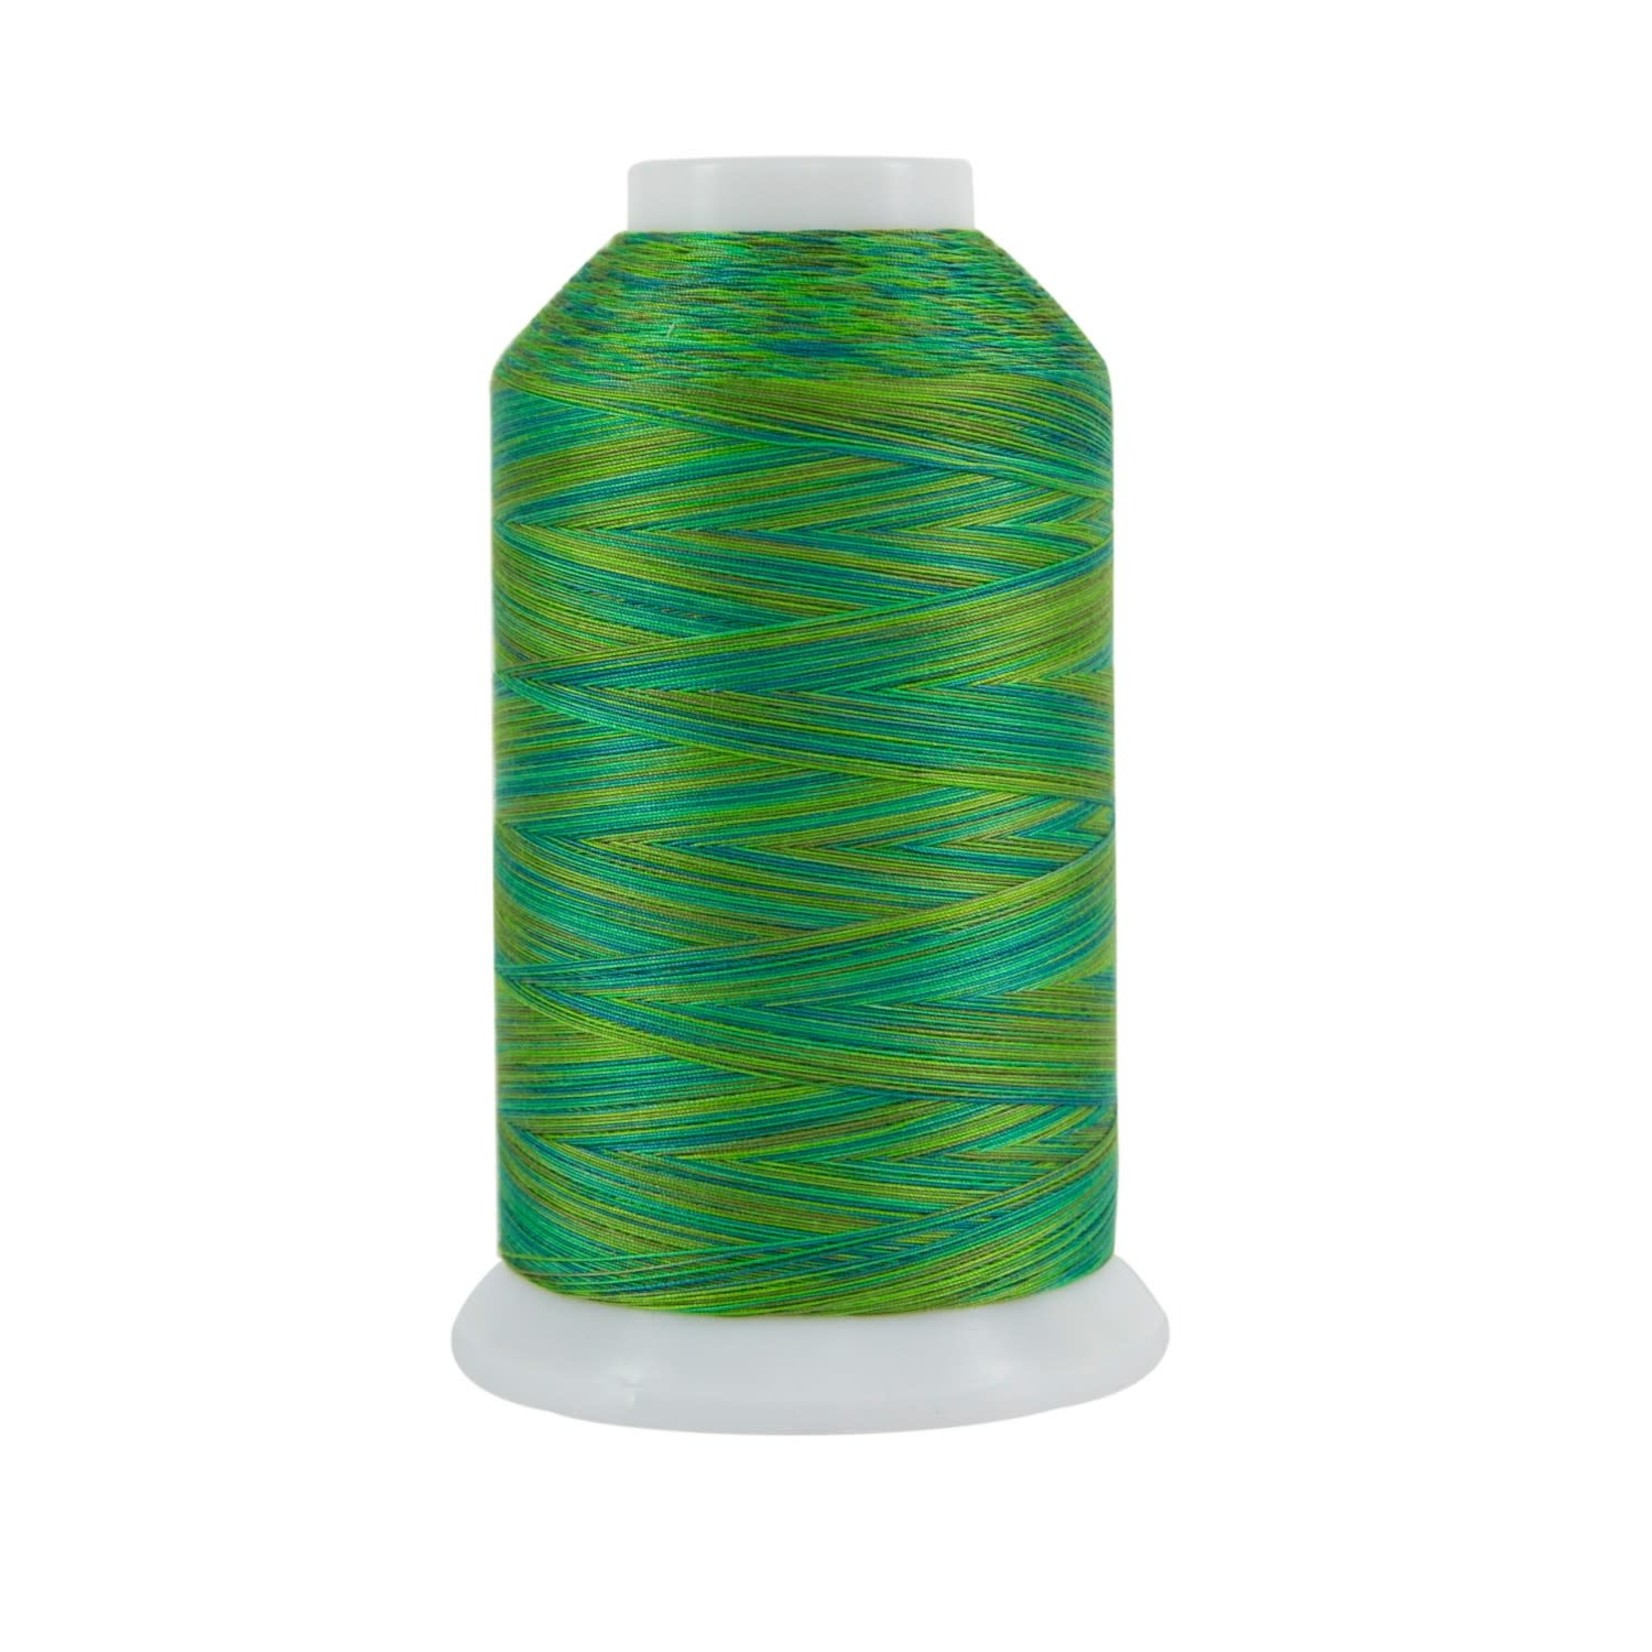 Superior Threads King Tut - #40 - 1828 m - 0923 Fahl Green